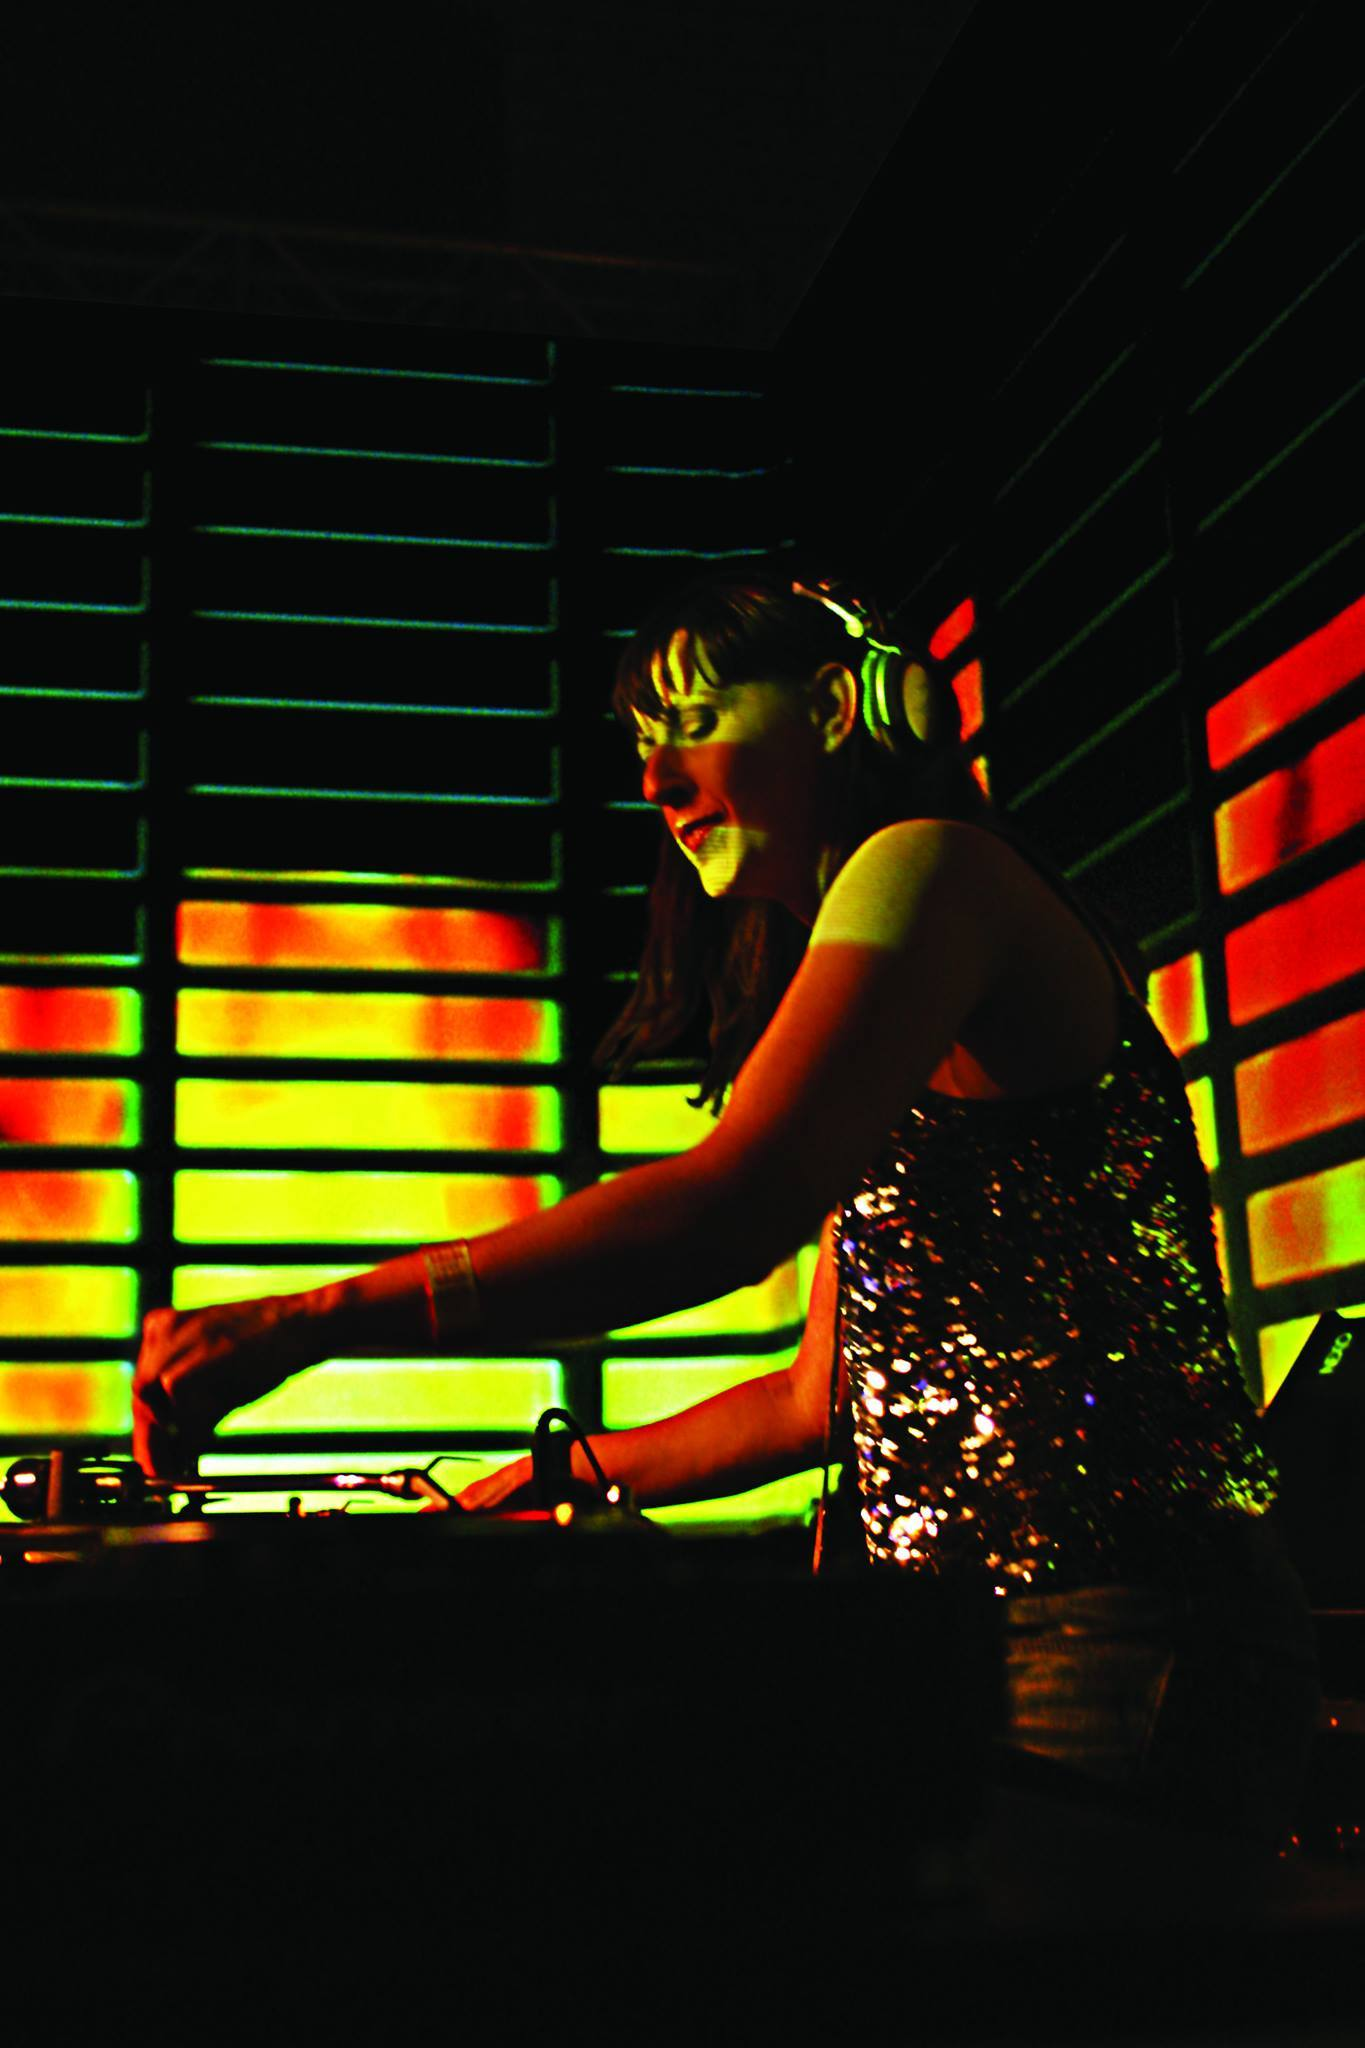 Photograph: DJ Storm